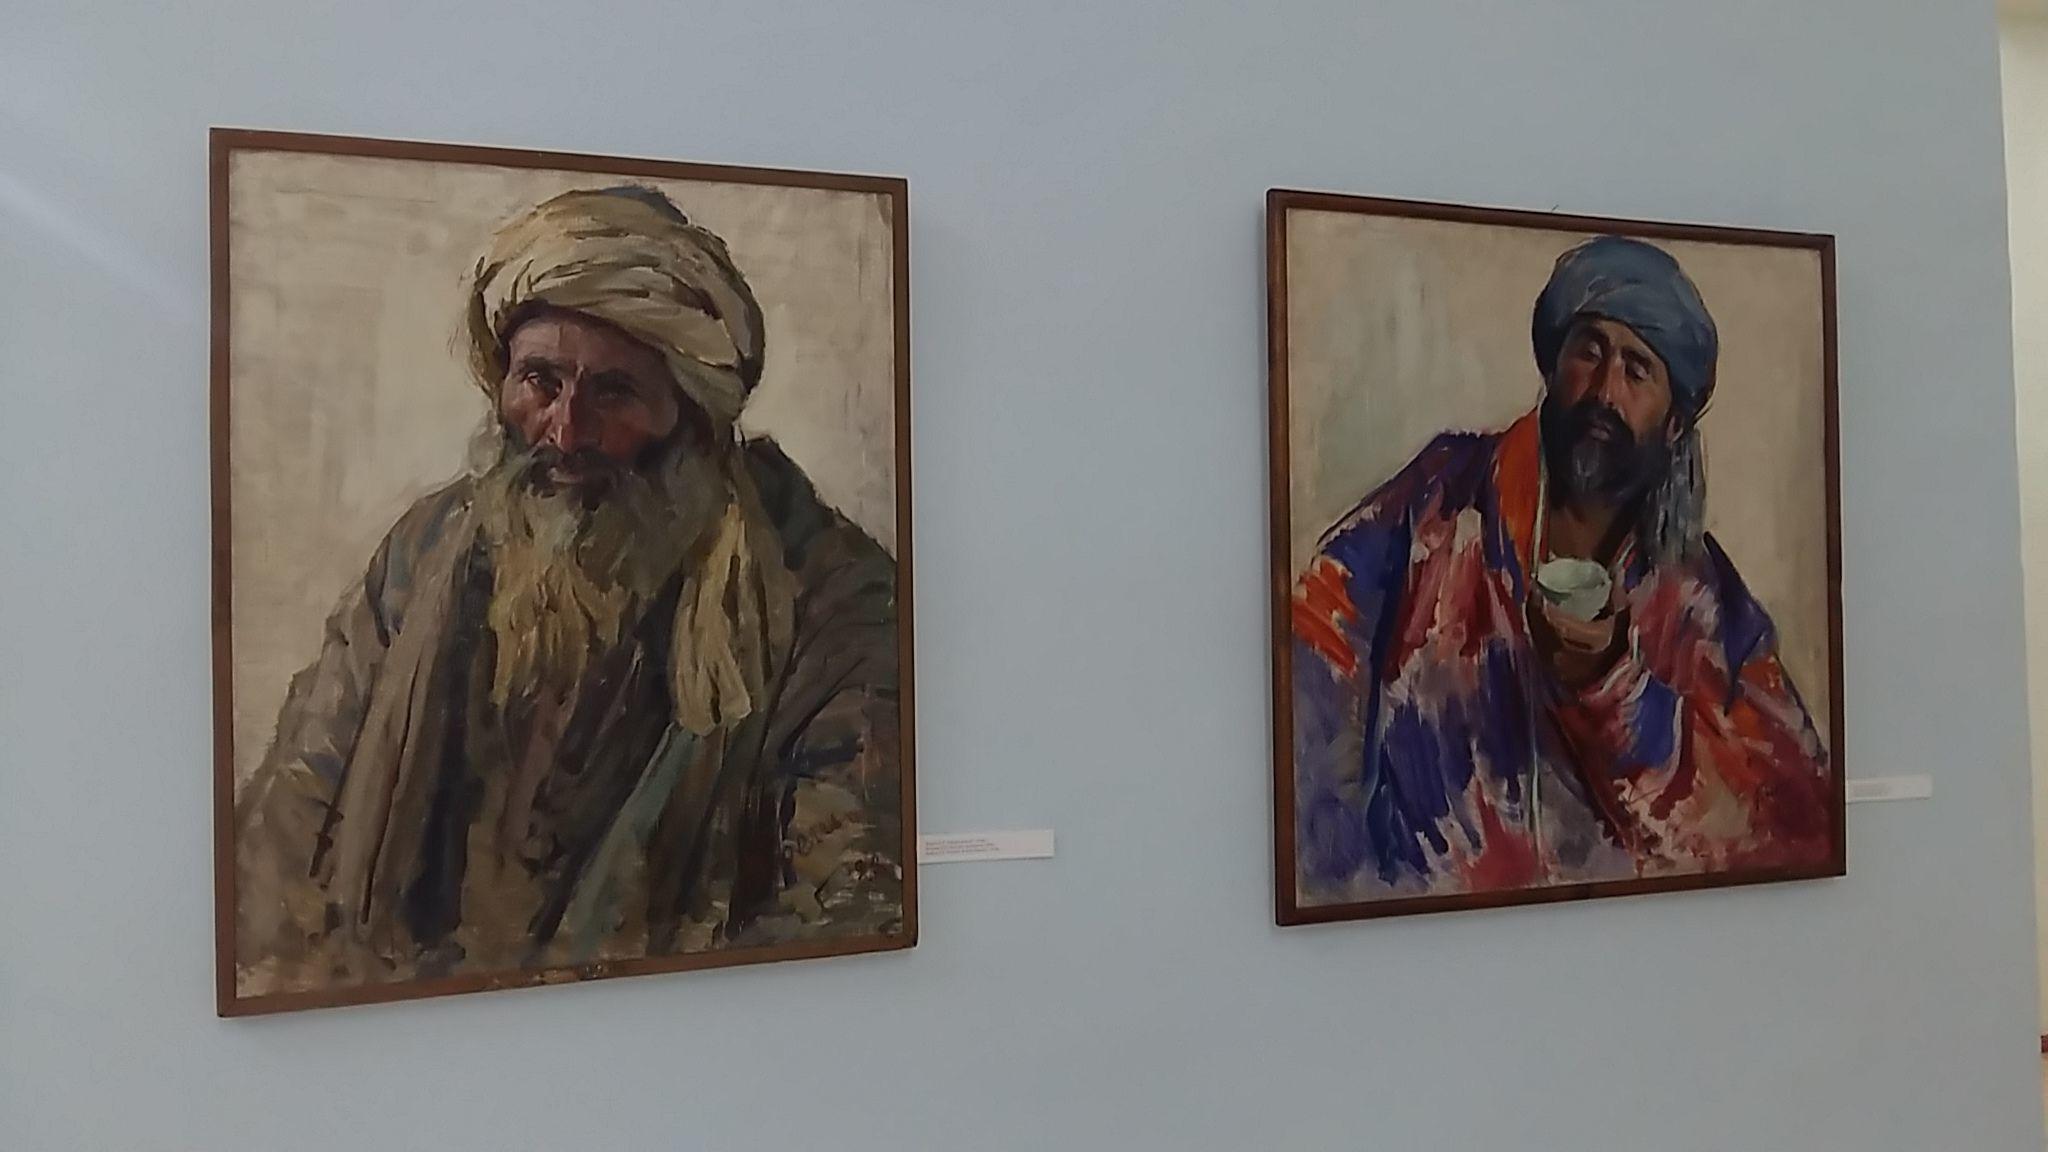 Boukhara Ouzbékistan Art Pavel Benkov Avant-garde Peinture Musée des beaux arts